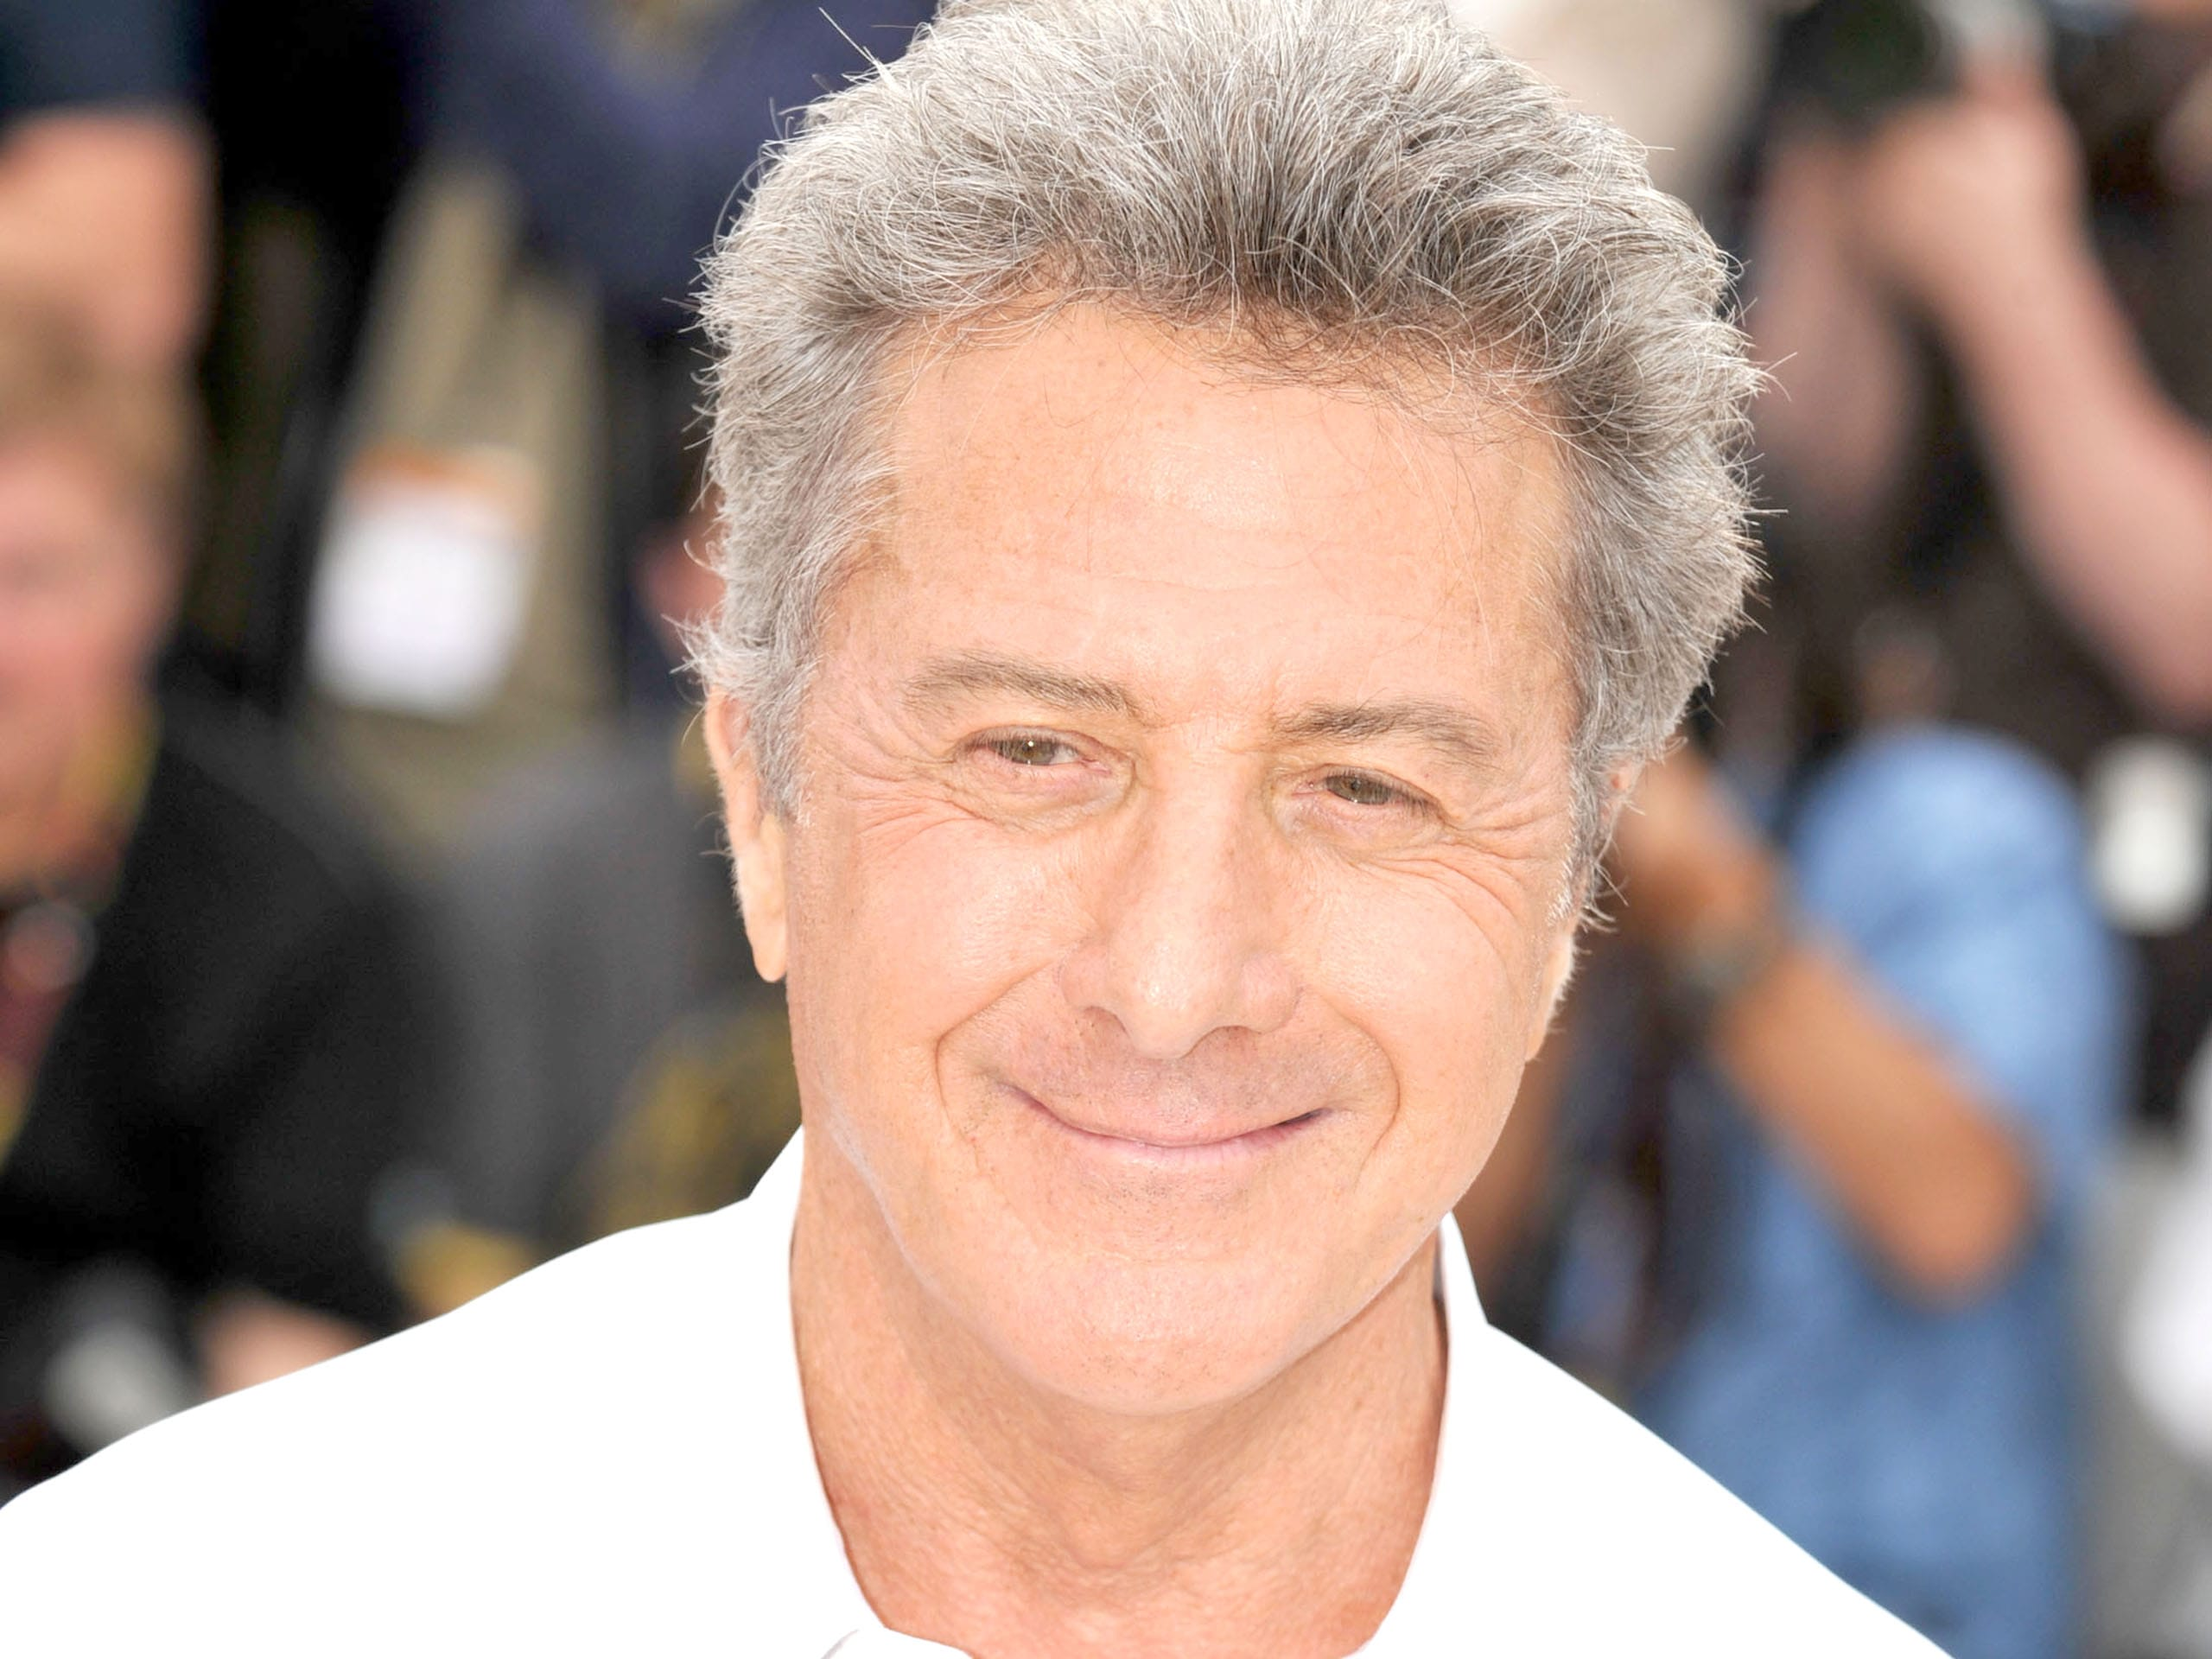 Dustin Hoffman Full hd wallpapers